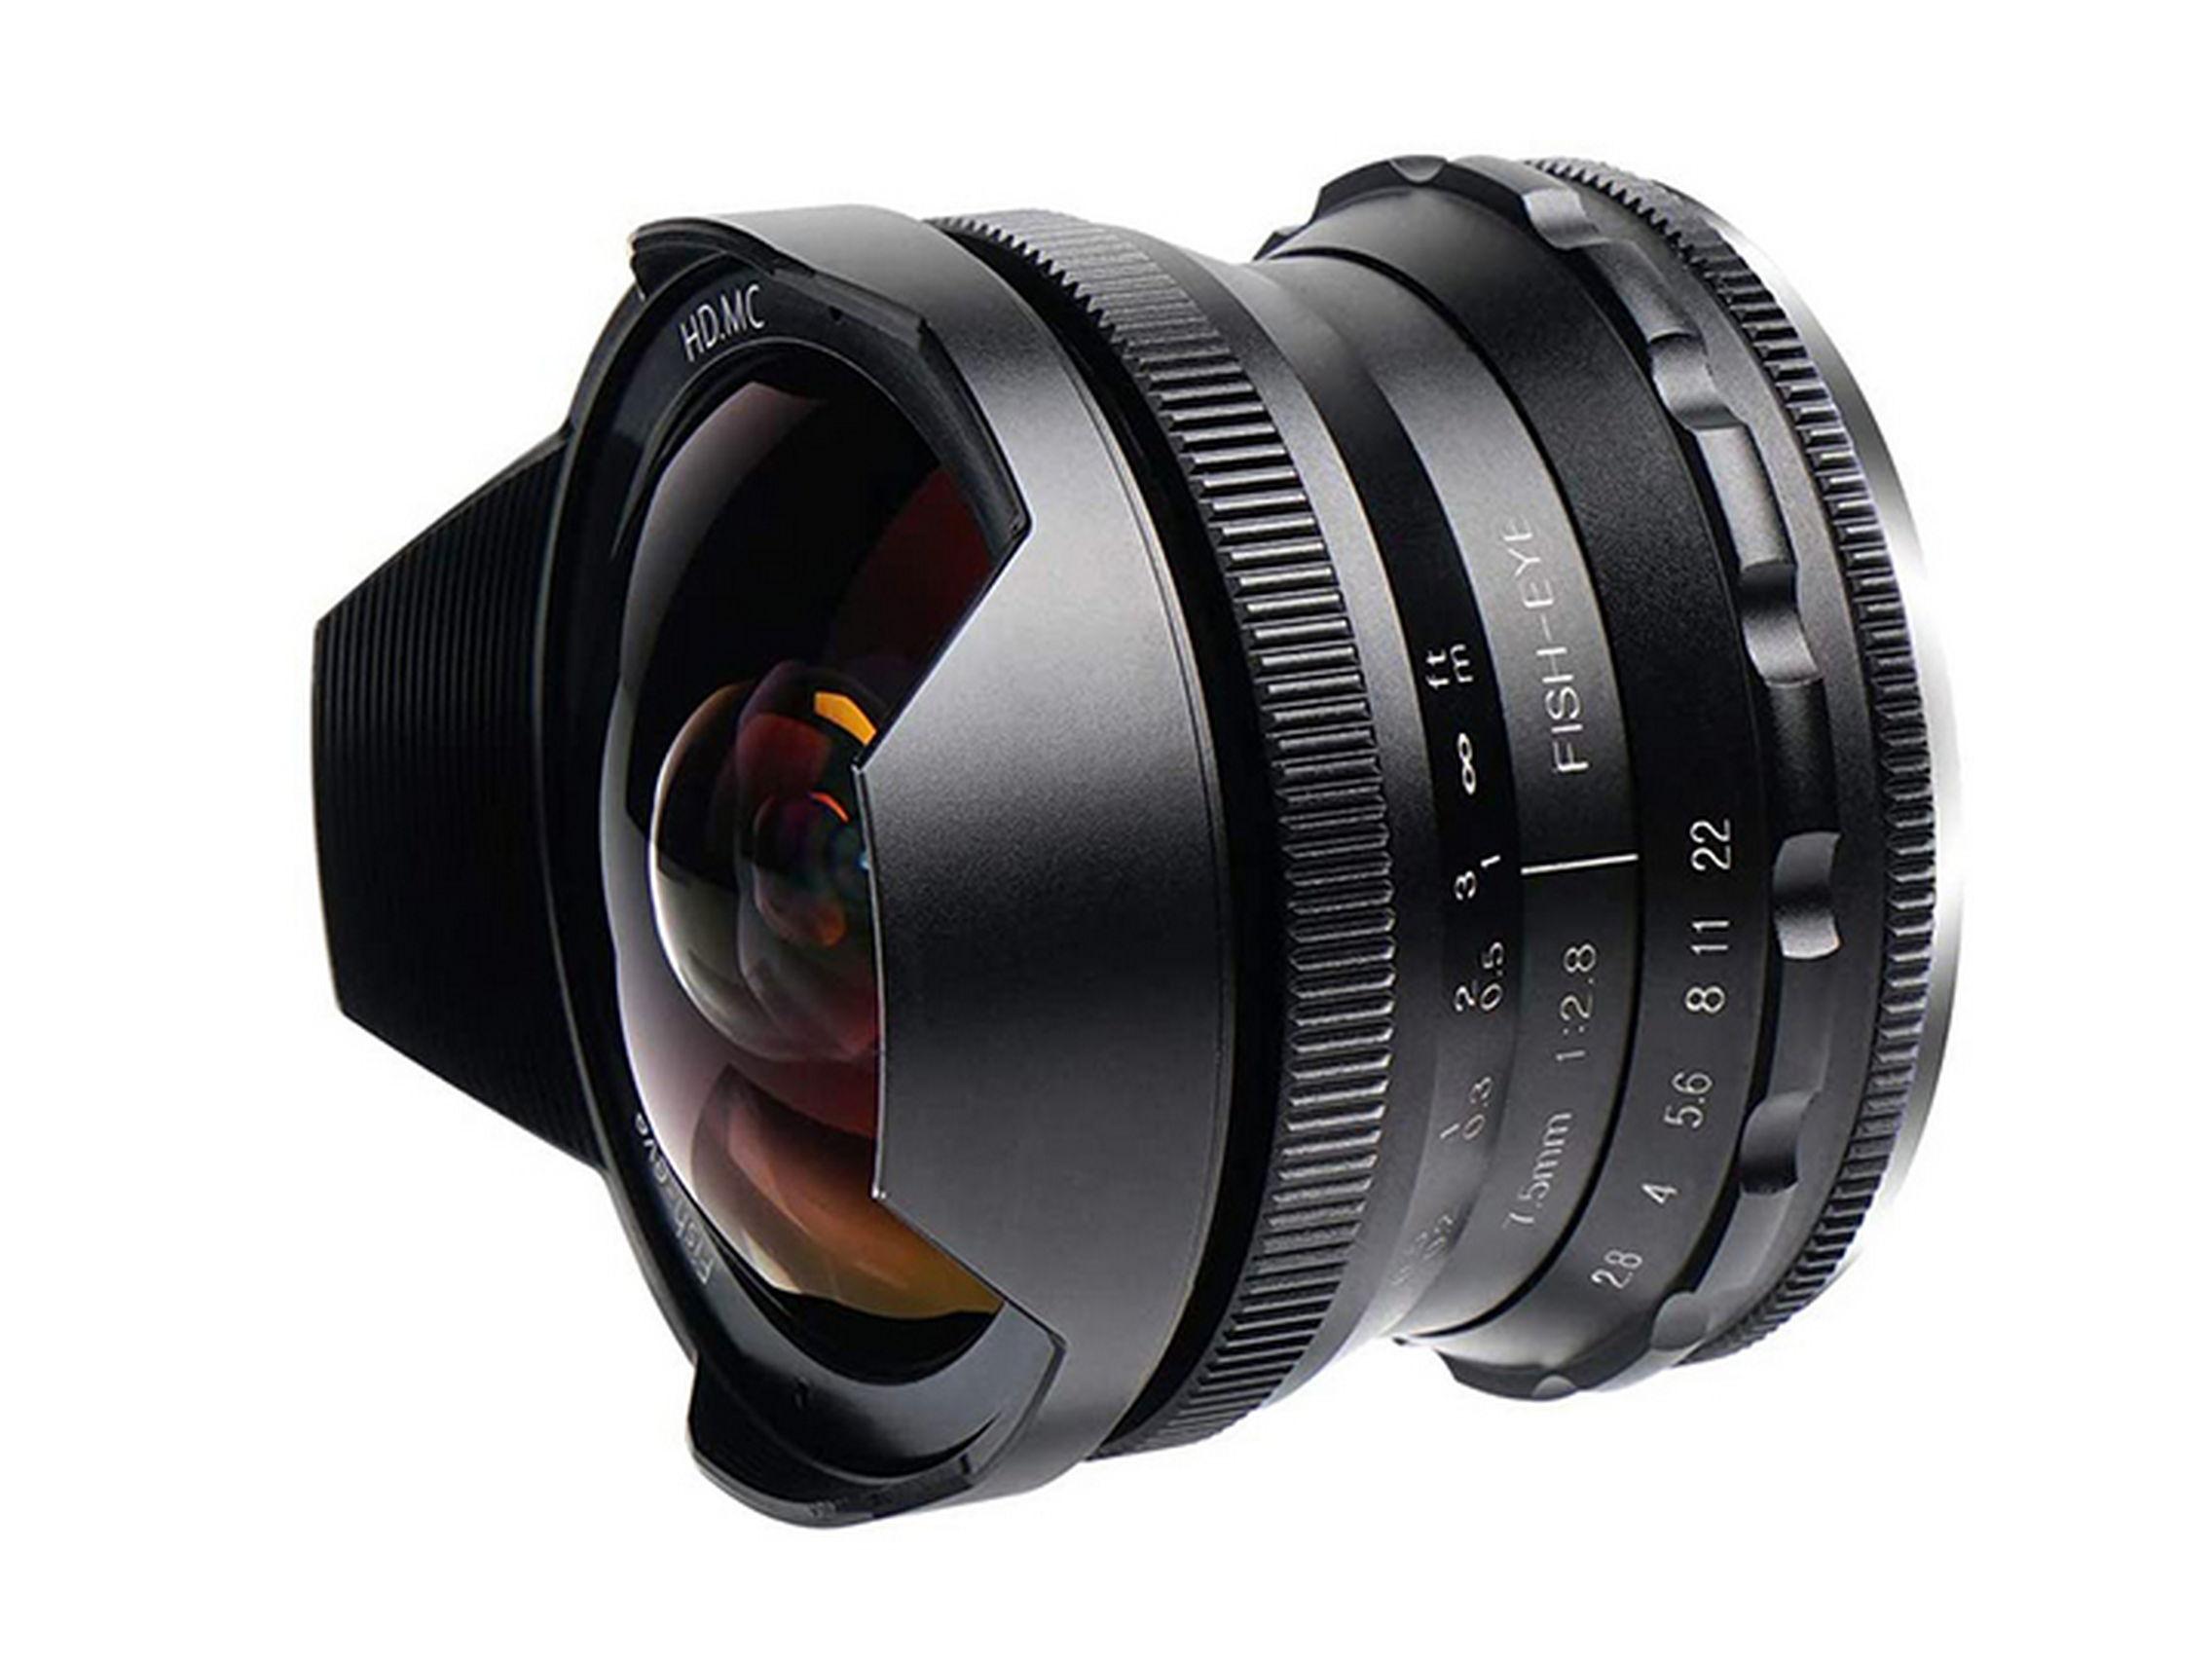 PERGEAR 7.5mm 2.8 HD MC Fish-eye APS-C